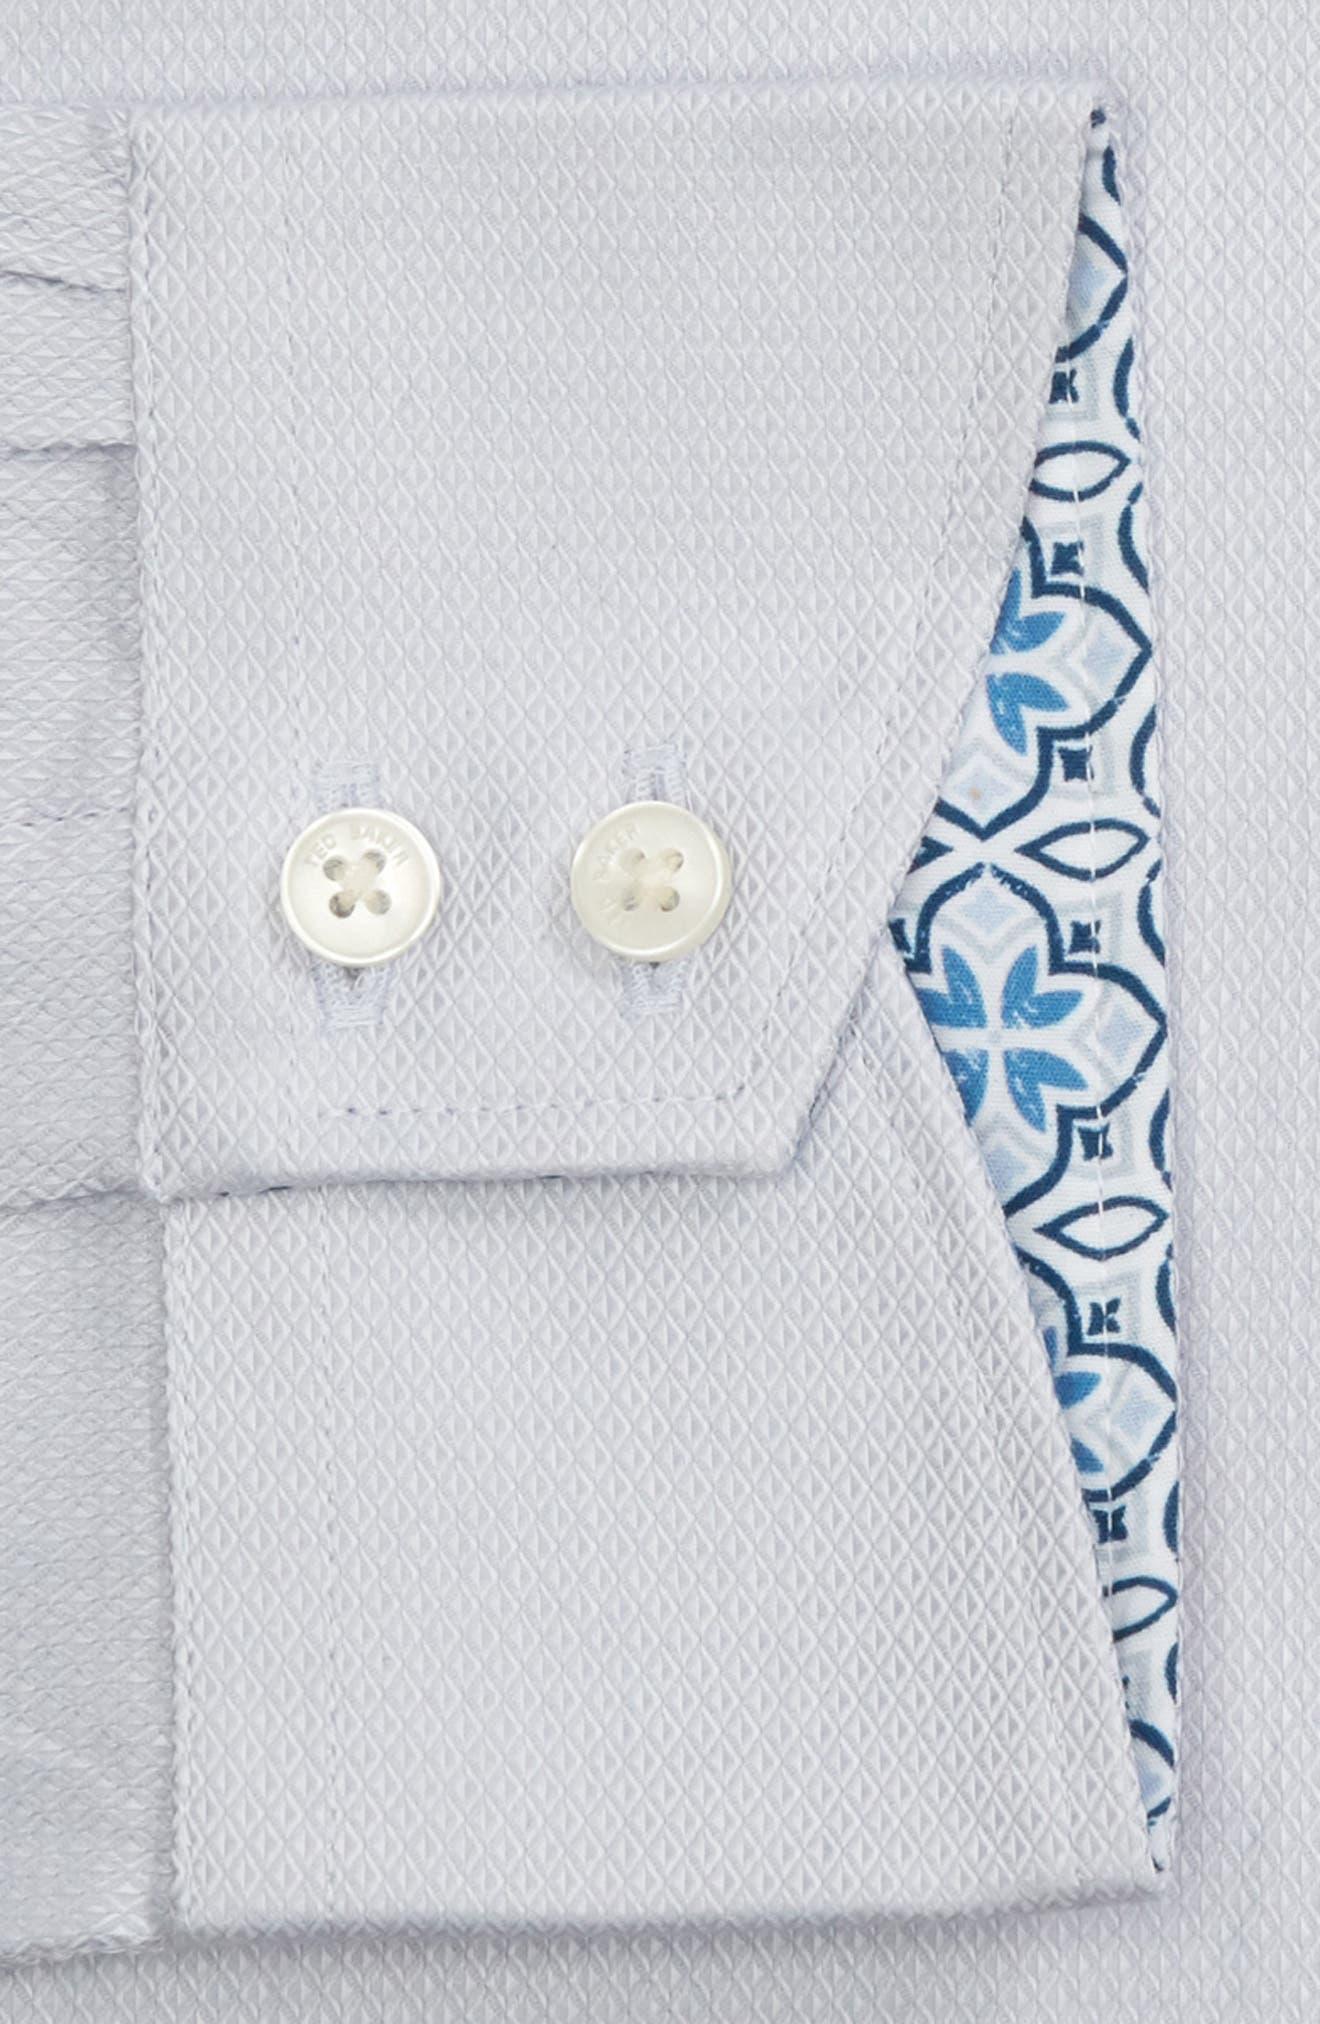 Ollyox Slim Fit Solid Dress Shirt,                             Alternate thumbnail 6, color,                             GREY